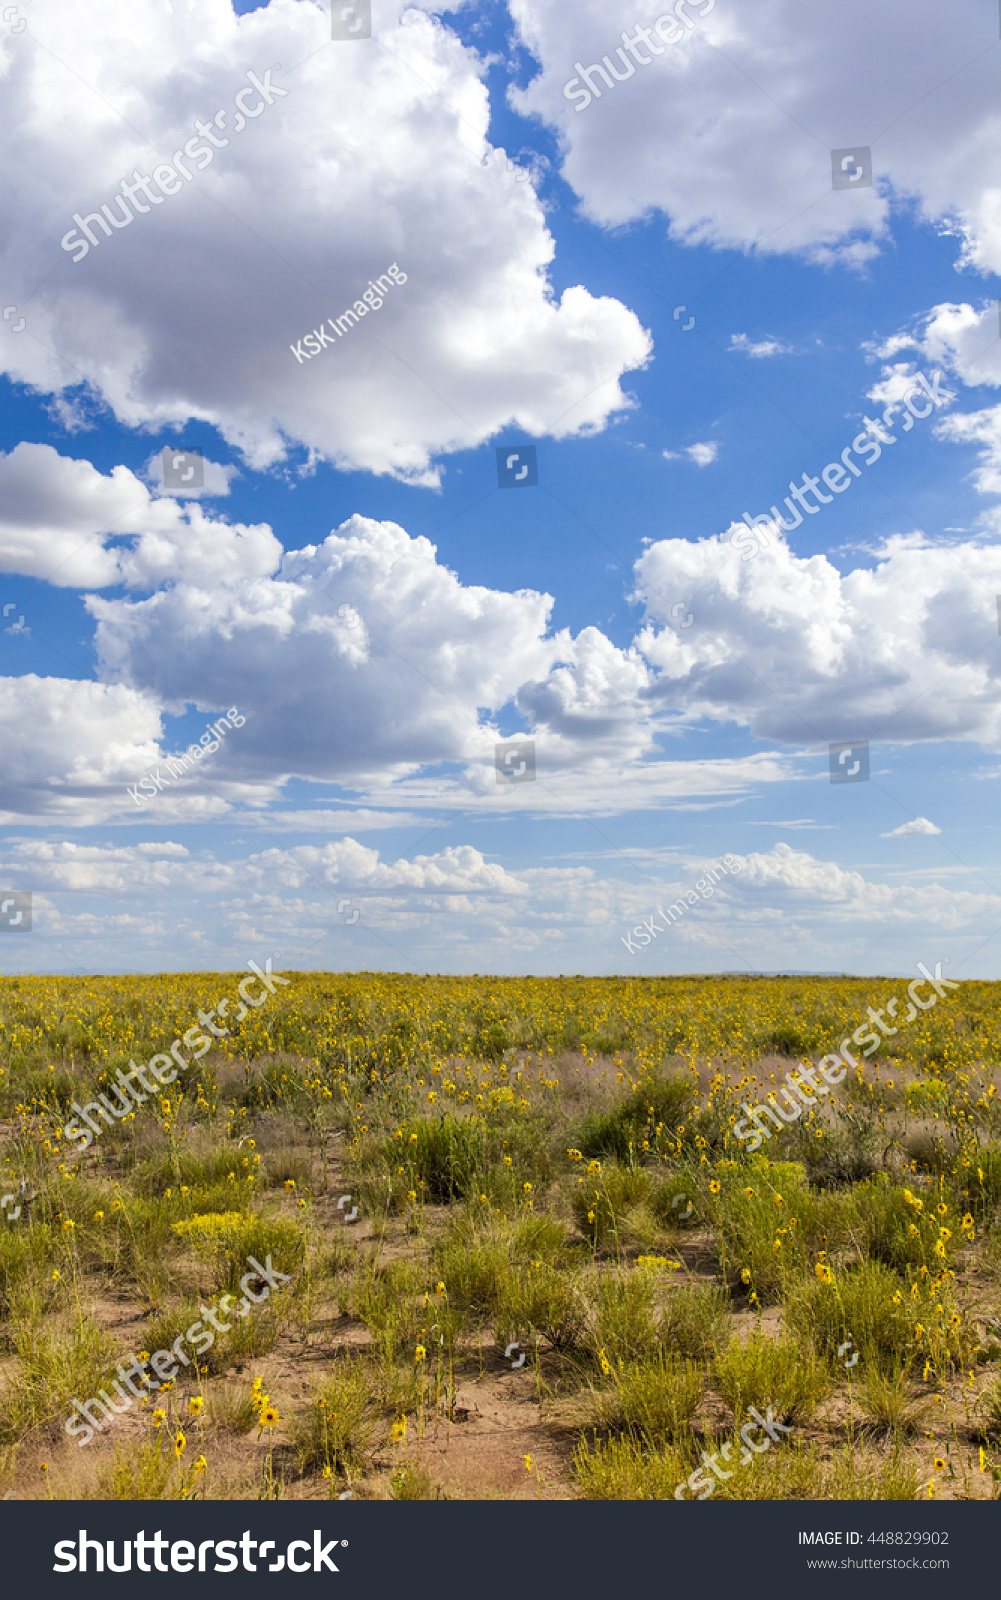 Beautiful sky and field of flowers ez canvas id 448829902 izmirmasajfo